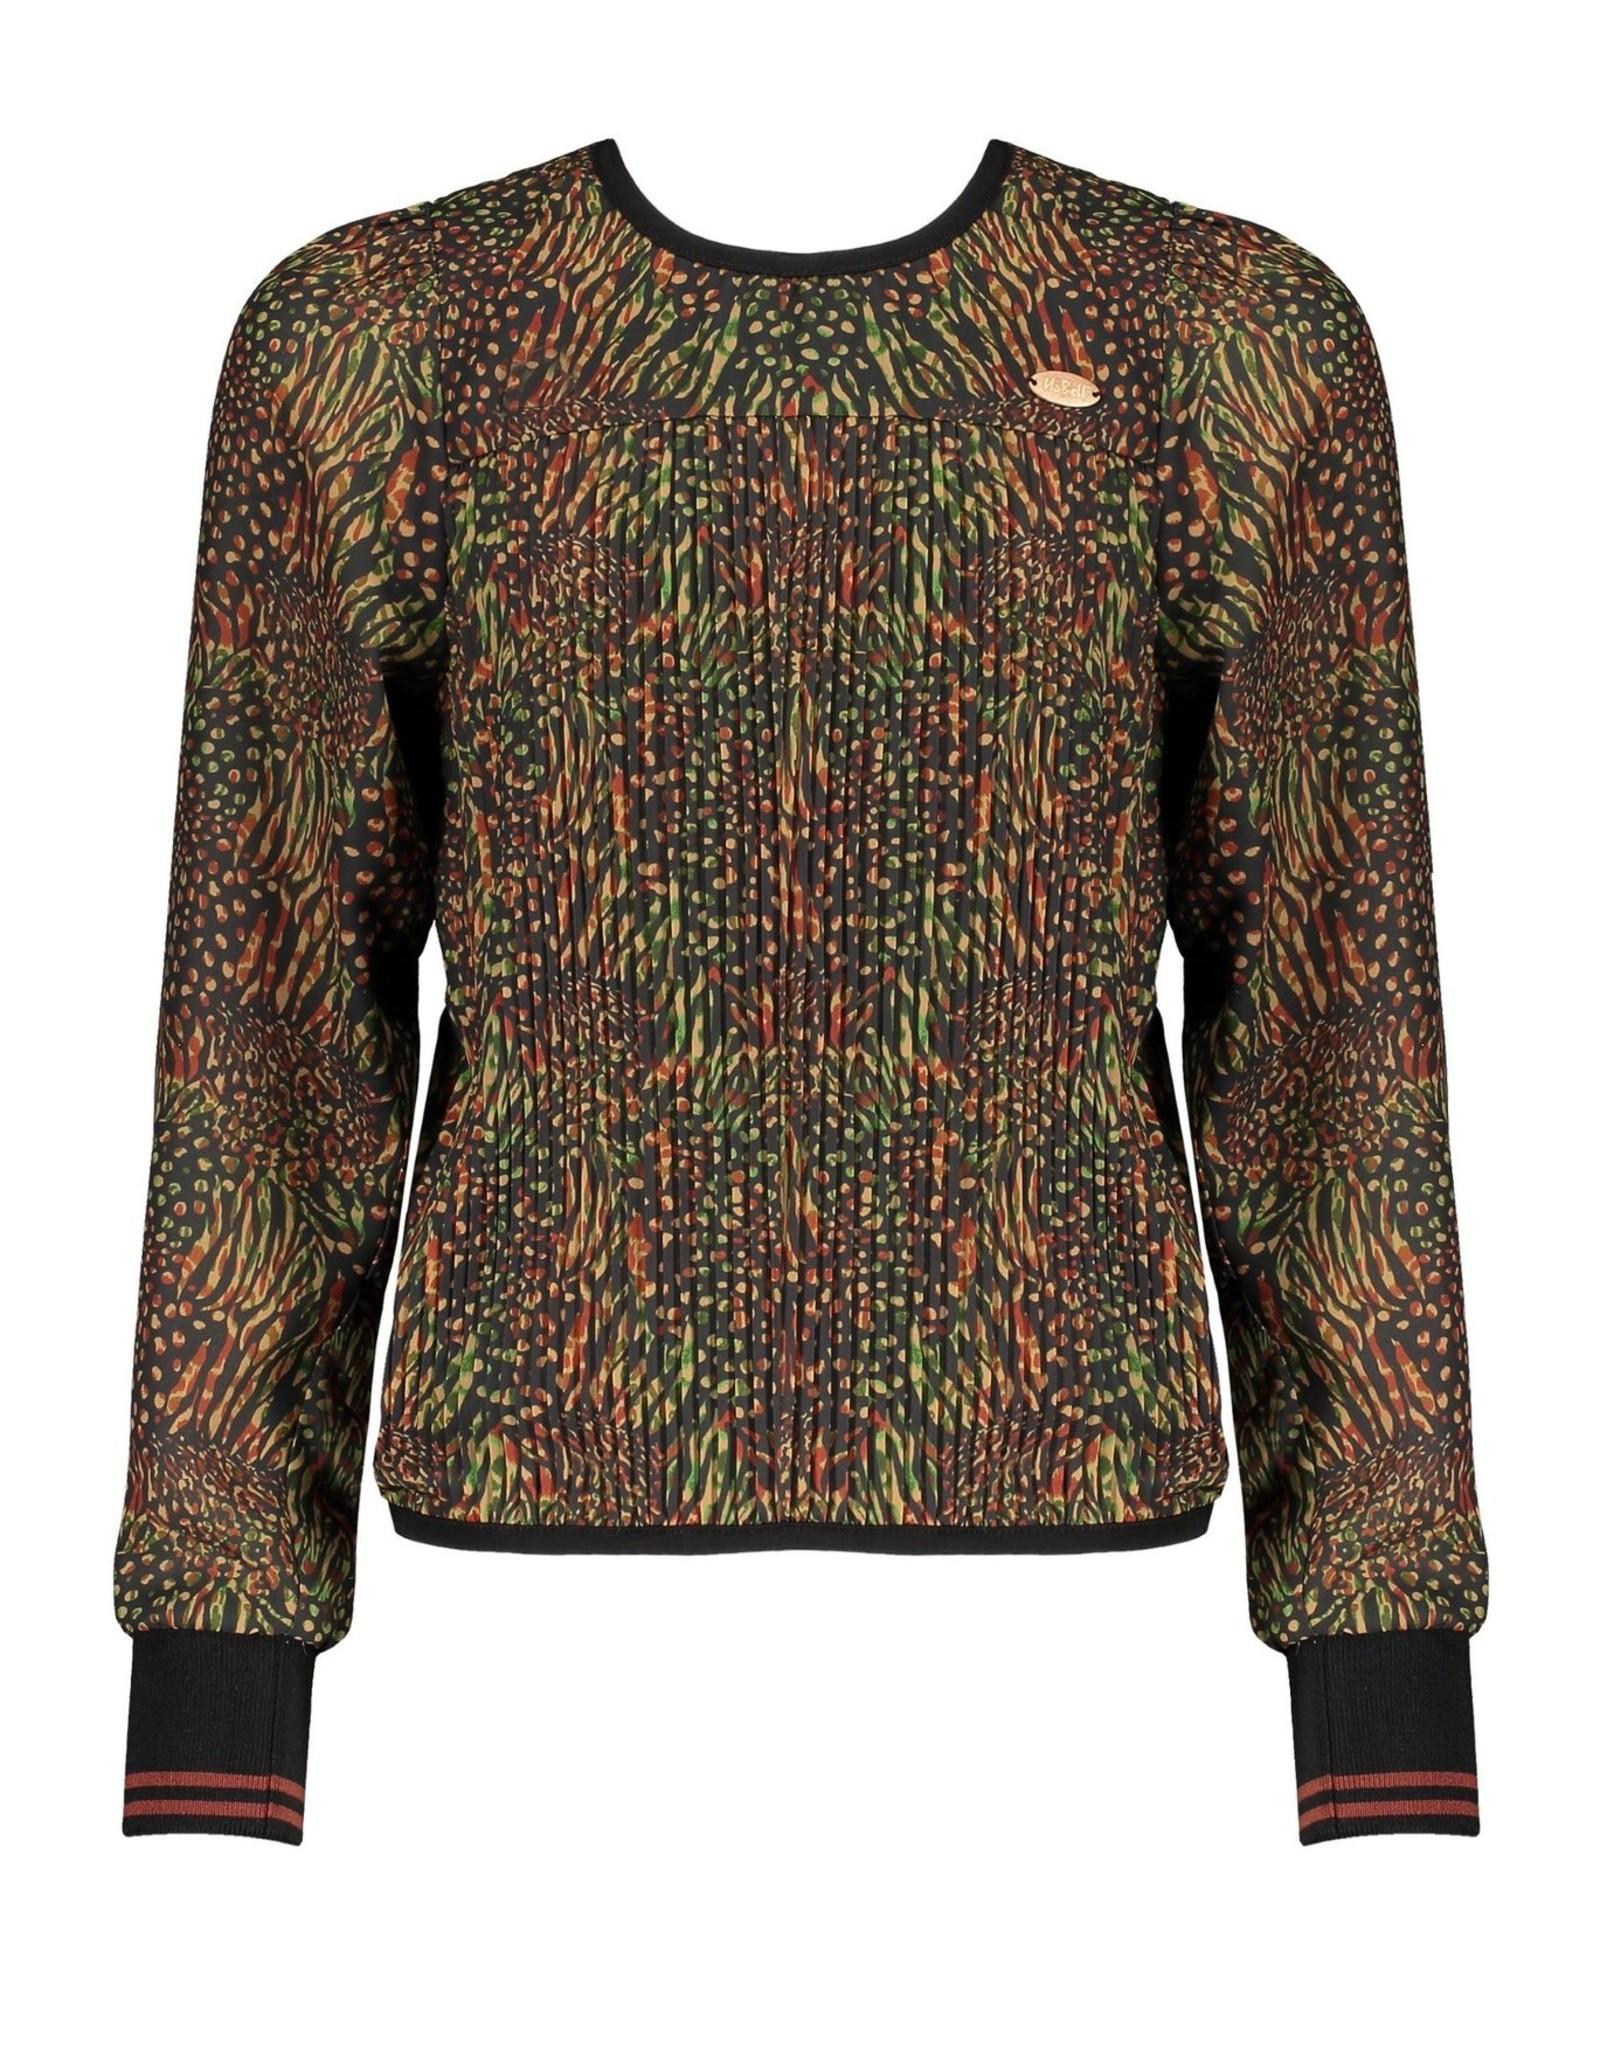 Nobell NoBell blouse 3100 army green